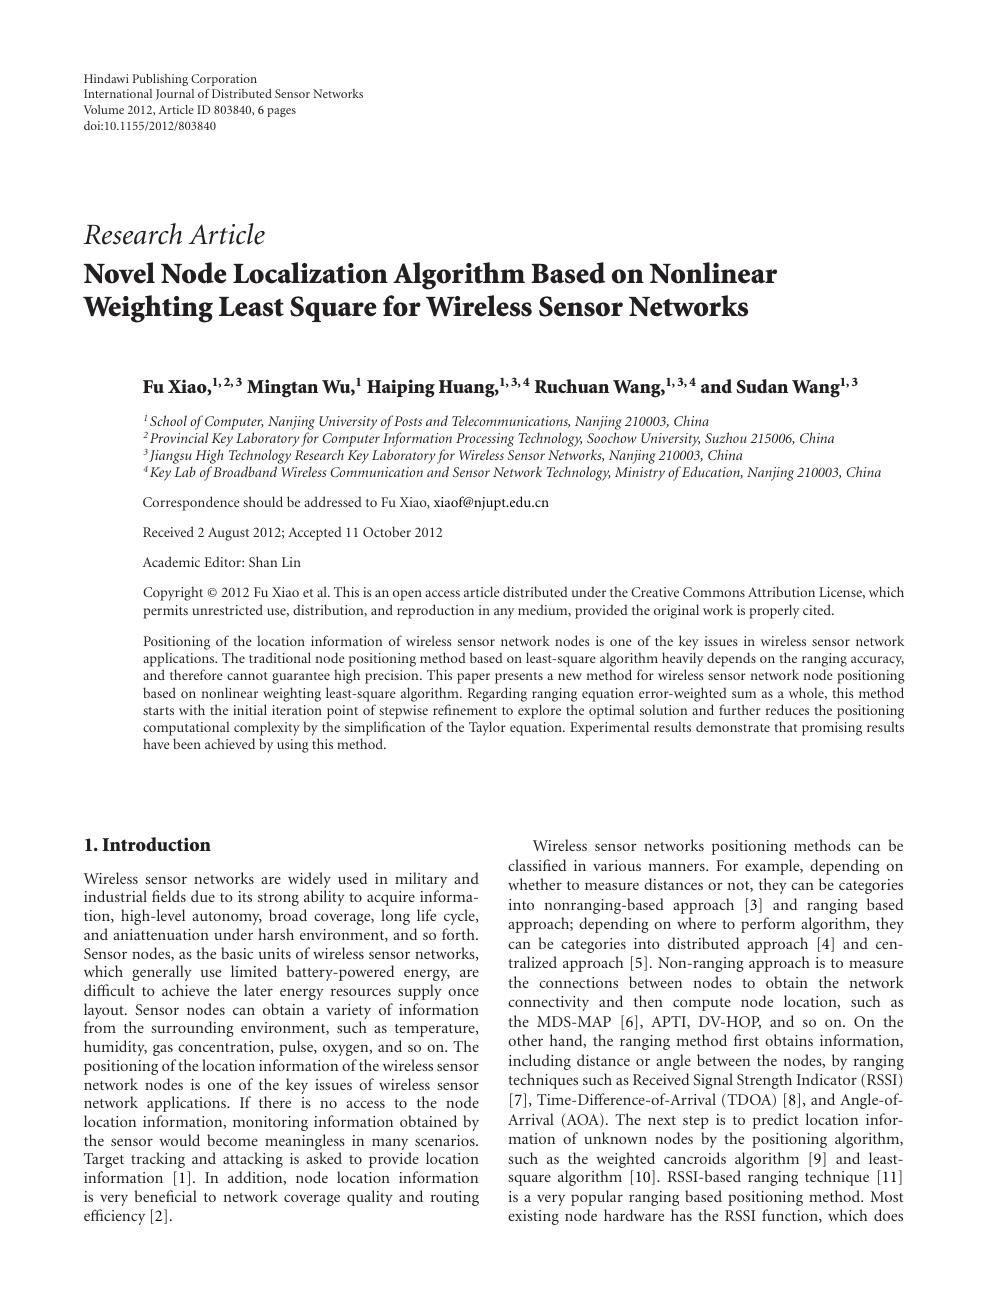 Novel Node Localization Algorithm Based on Nonlinear